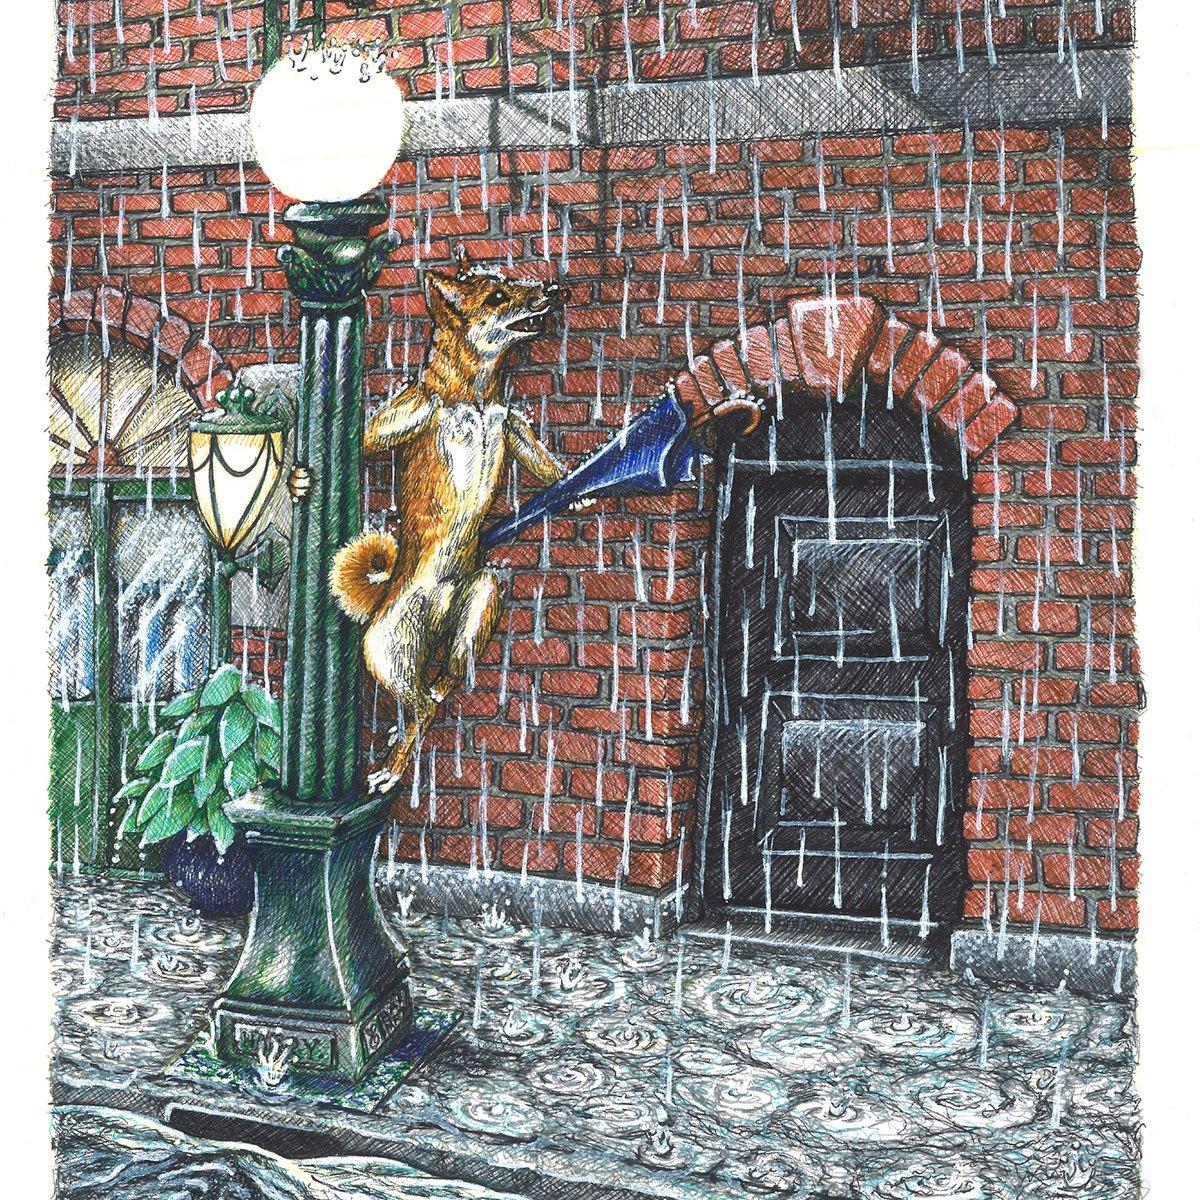 Harry in the Rain